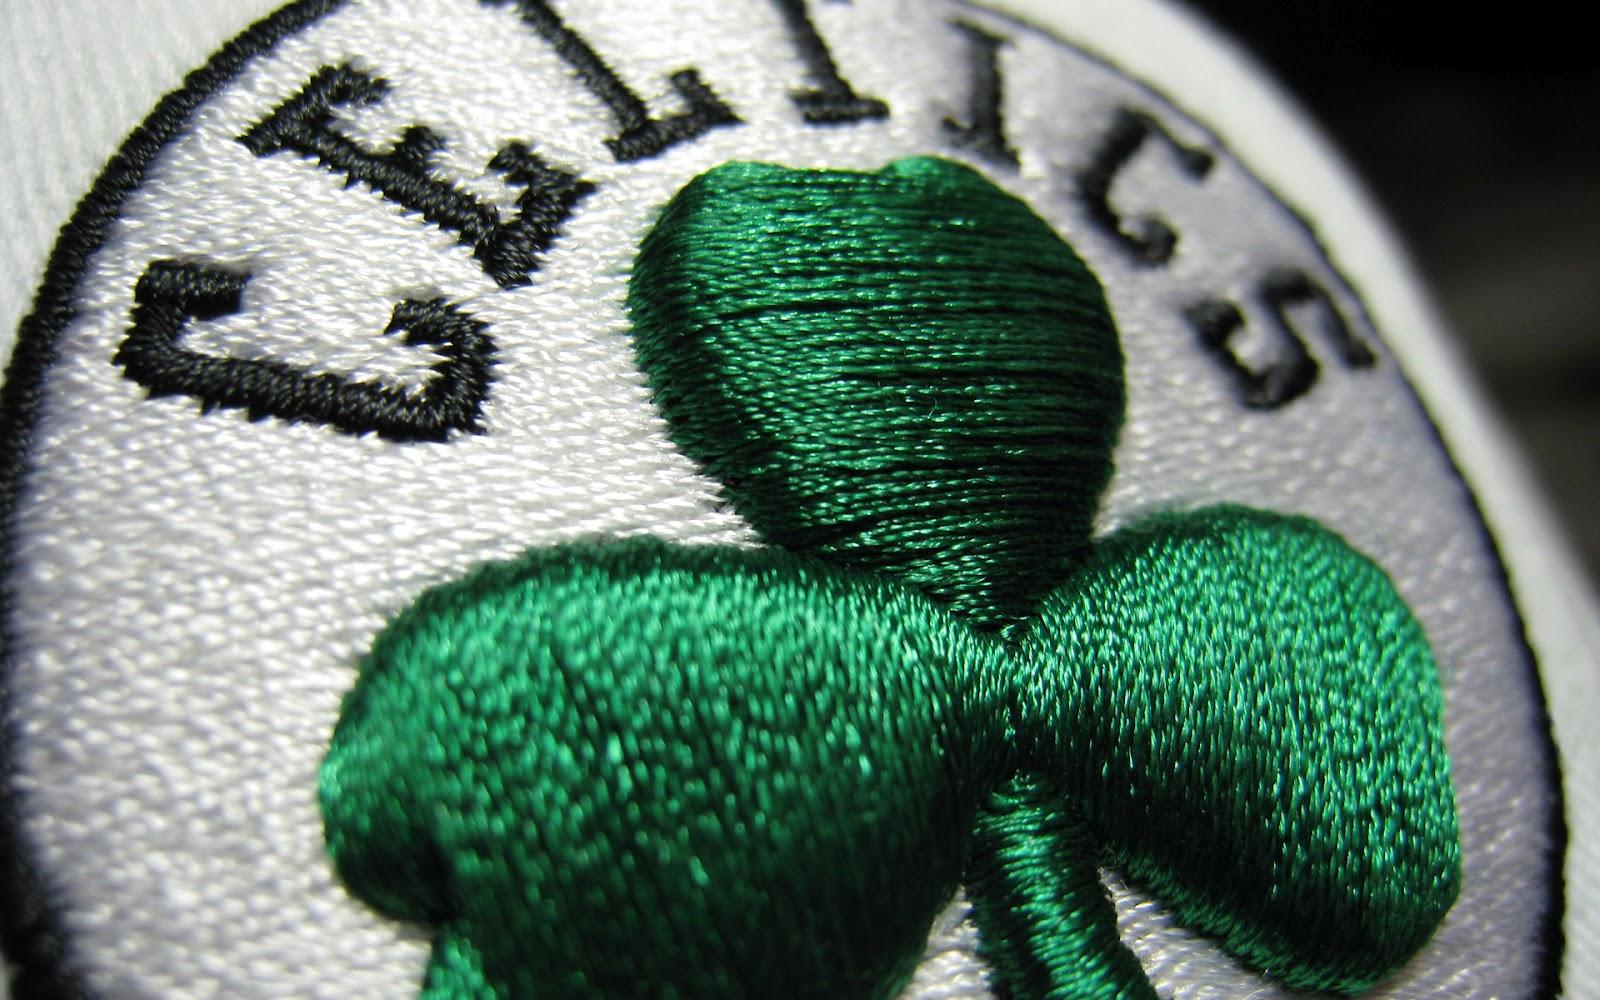 Pic New Posts Wallpaper Boston Celtics